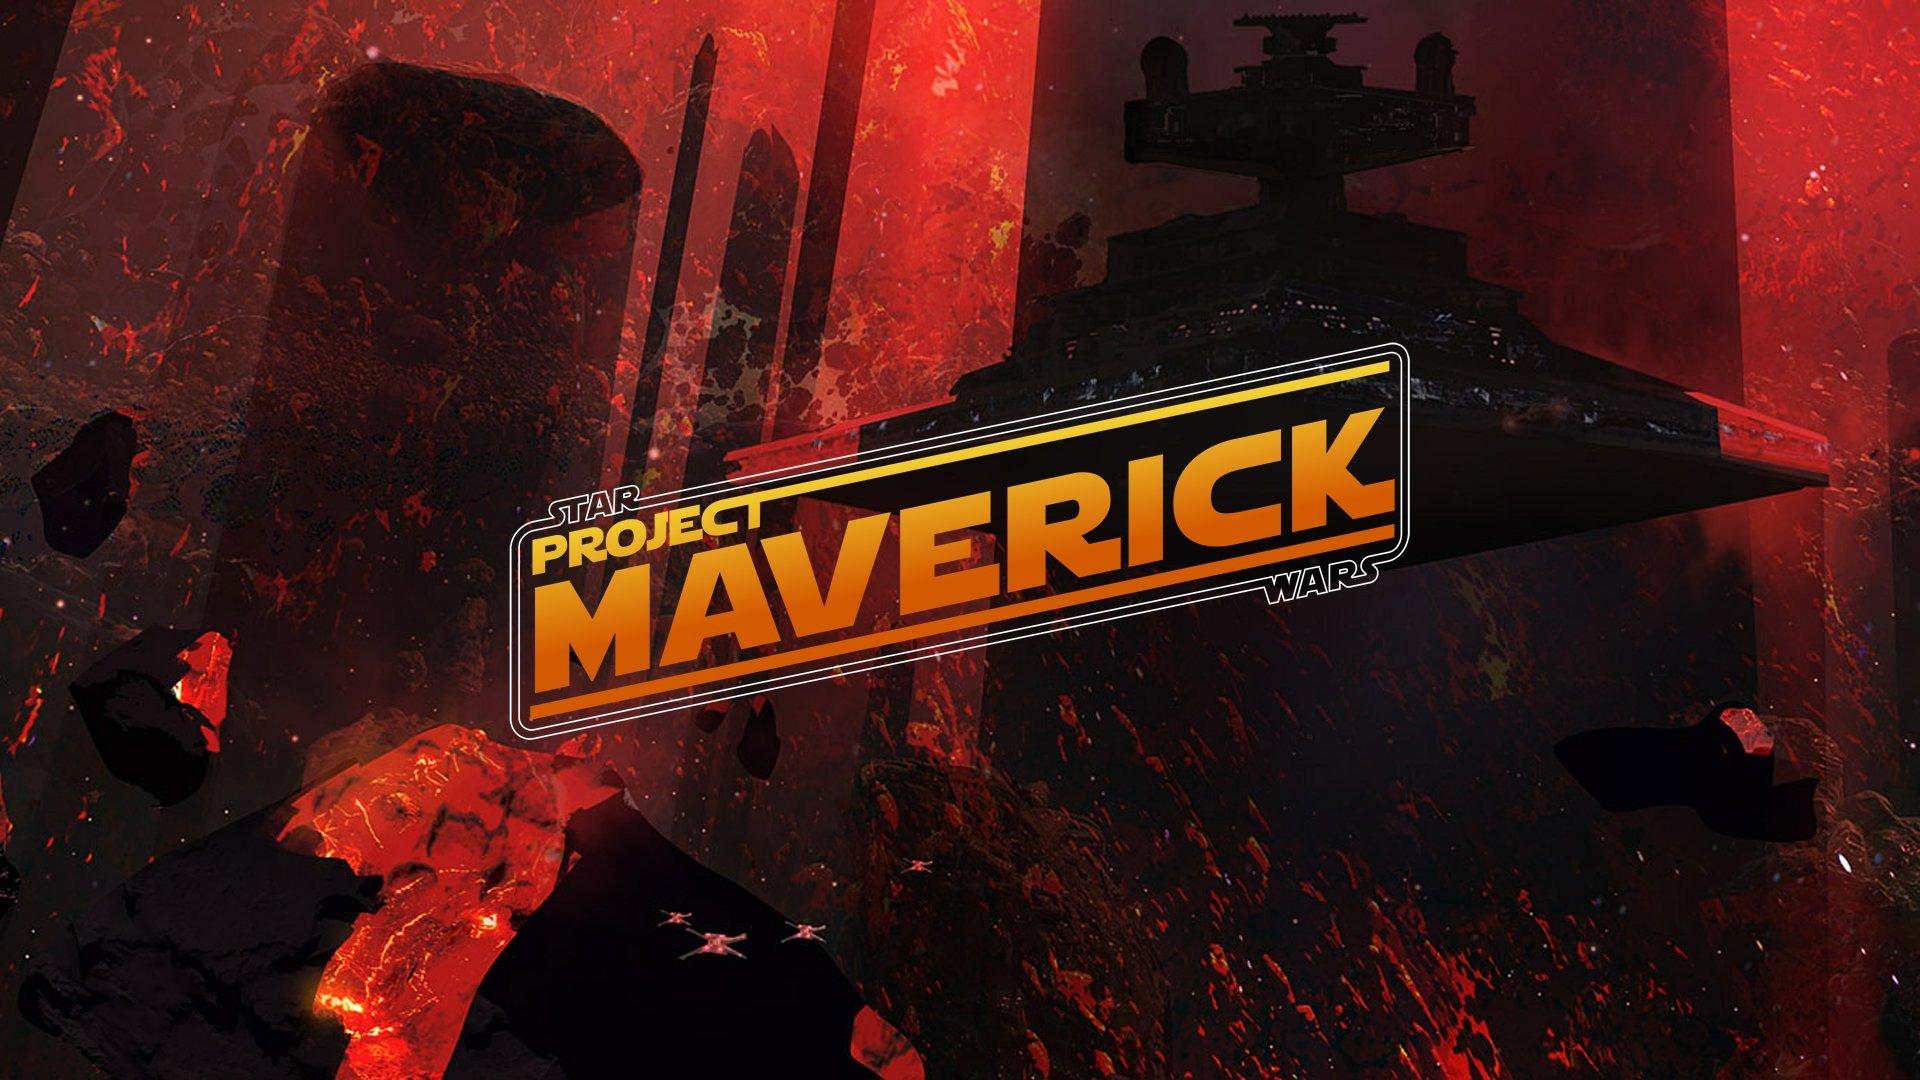 star-wars-project-maverick.jpg